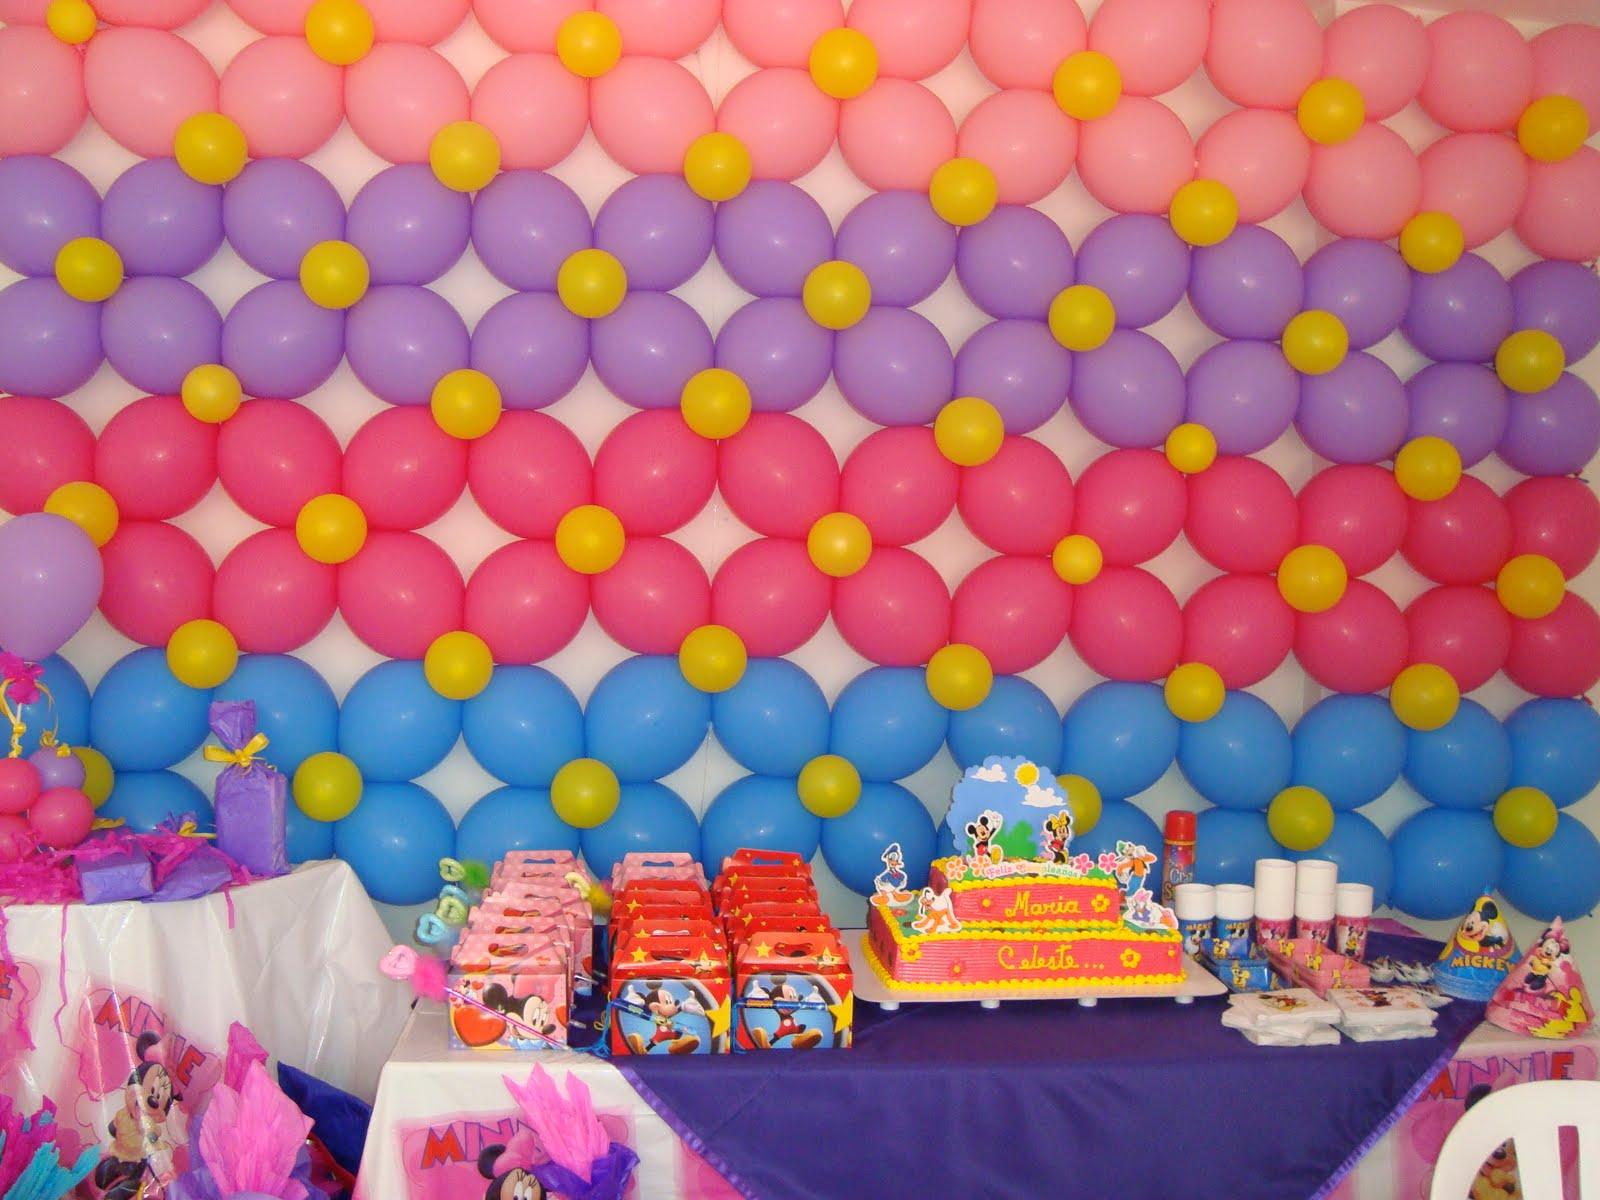 Decoracion con globos para fiestas infantiles tattoo - Decoracion de globos ...